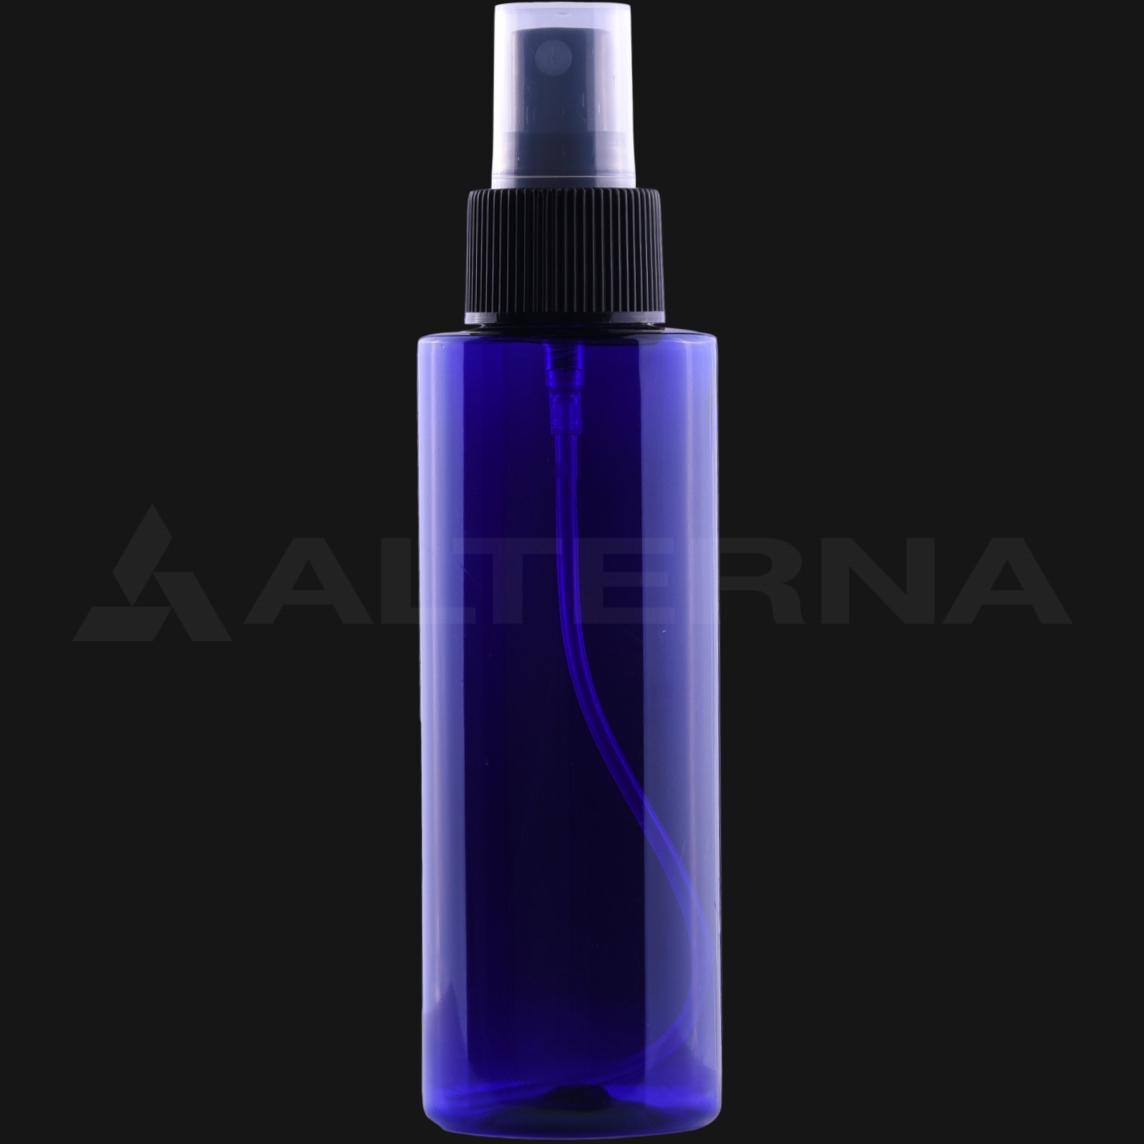 125 ml PET Bottle with 24 mm Sprayer